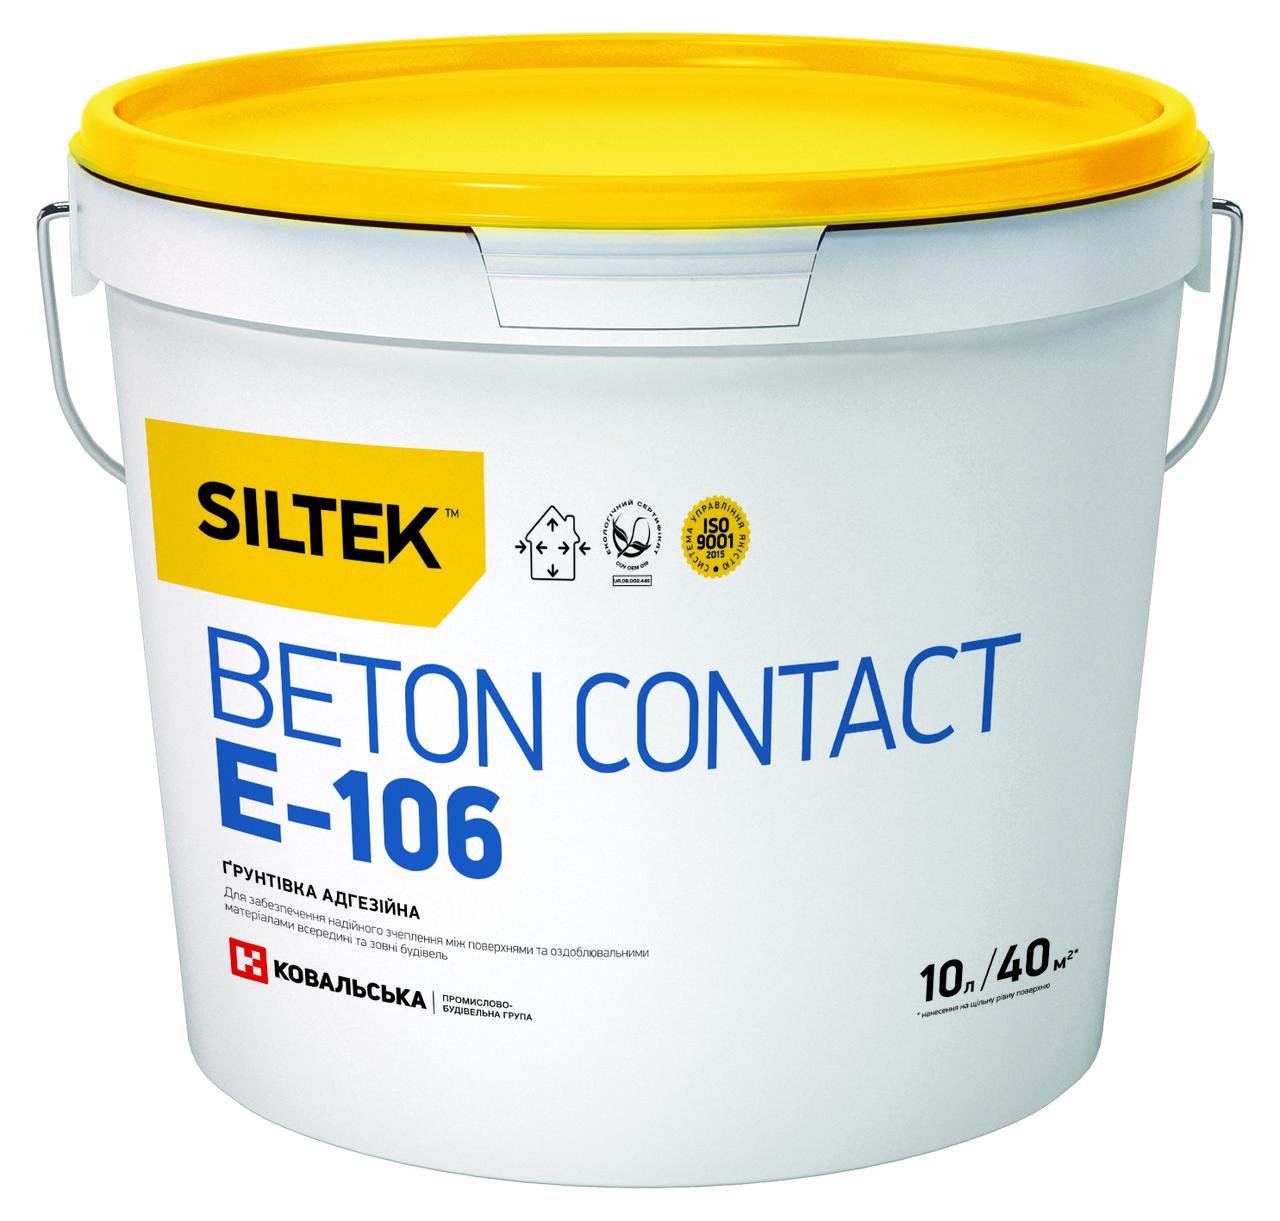 Грунтовка SILTEK BETON CONTACT E-106 адгезионная, 5л